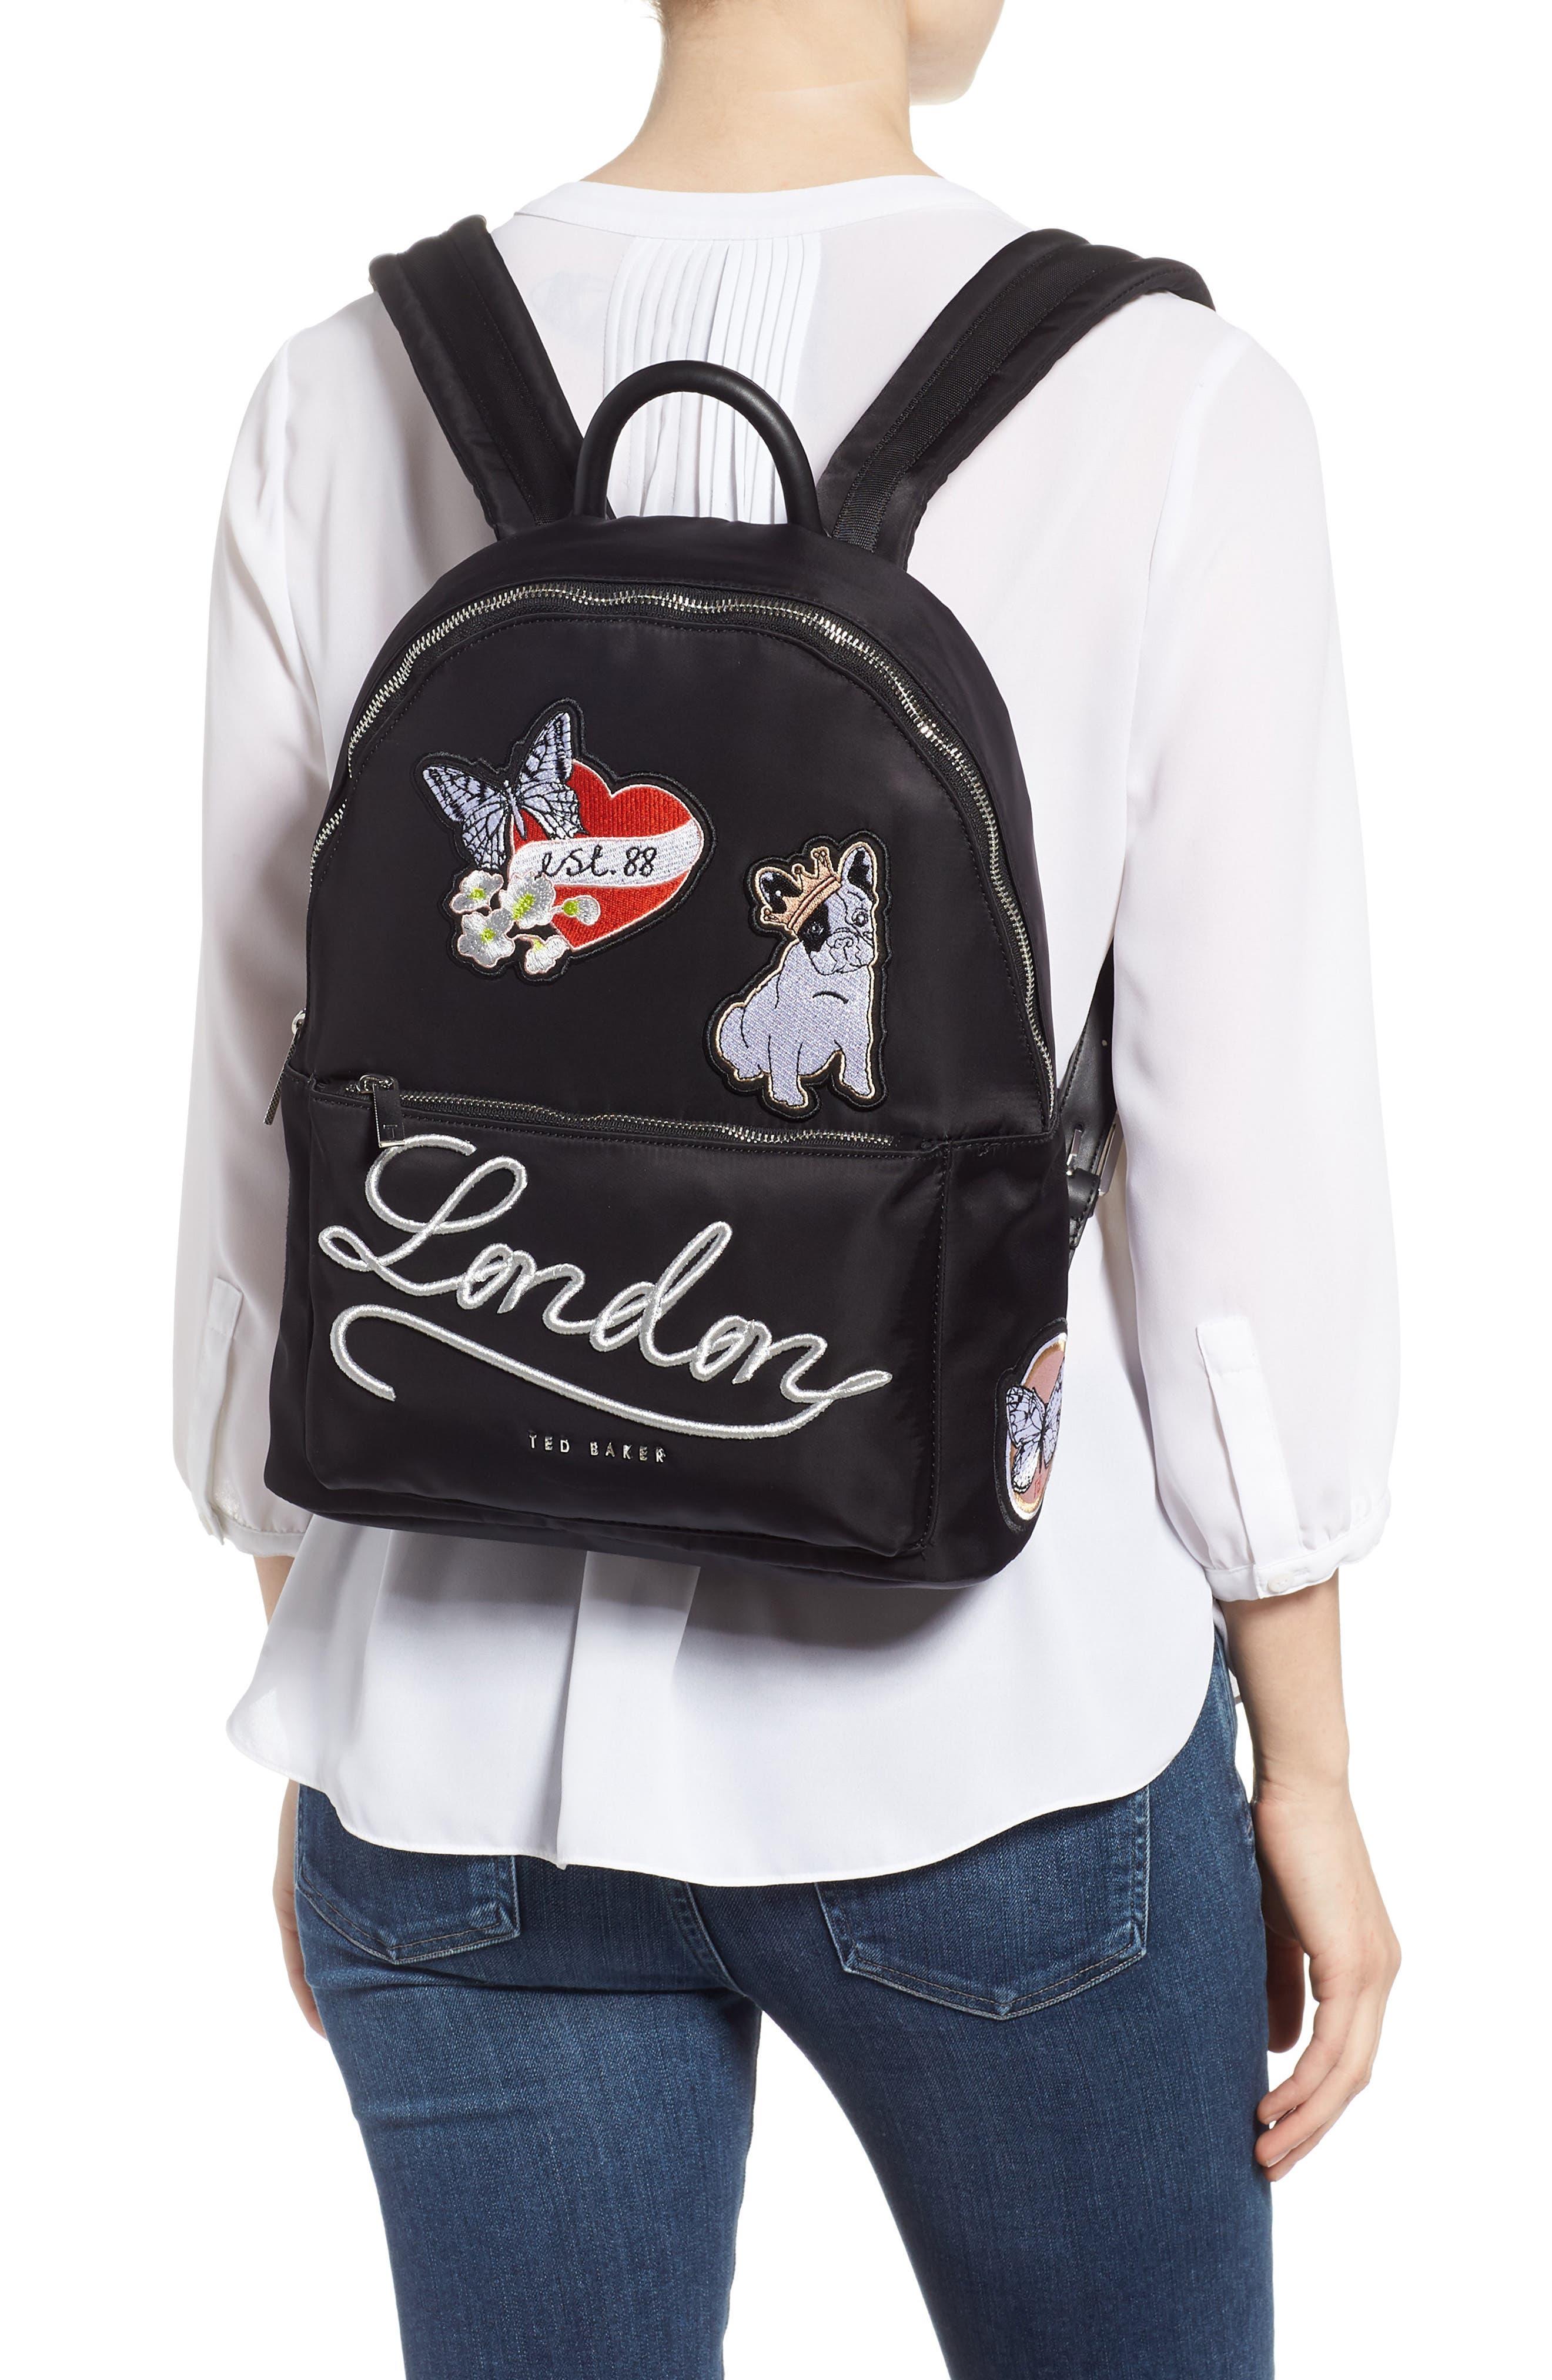 Sofiahh Nylon Backpack,                             Alternate thumbnail 2, color,                             BLACK